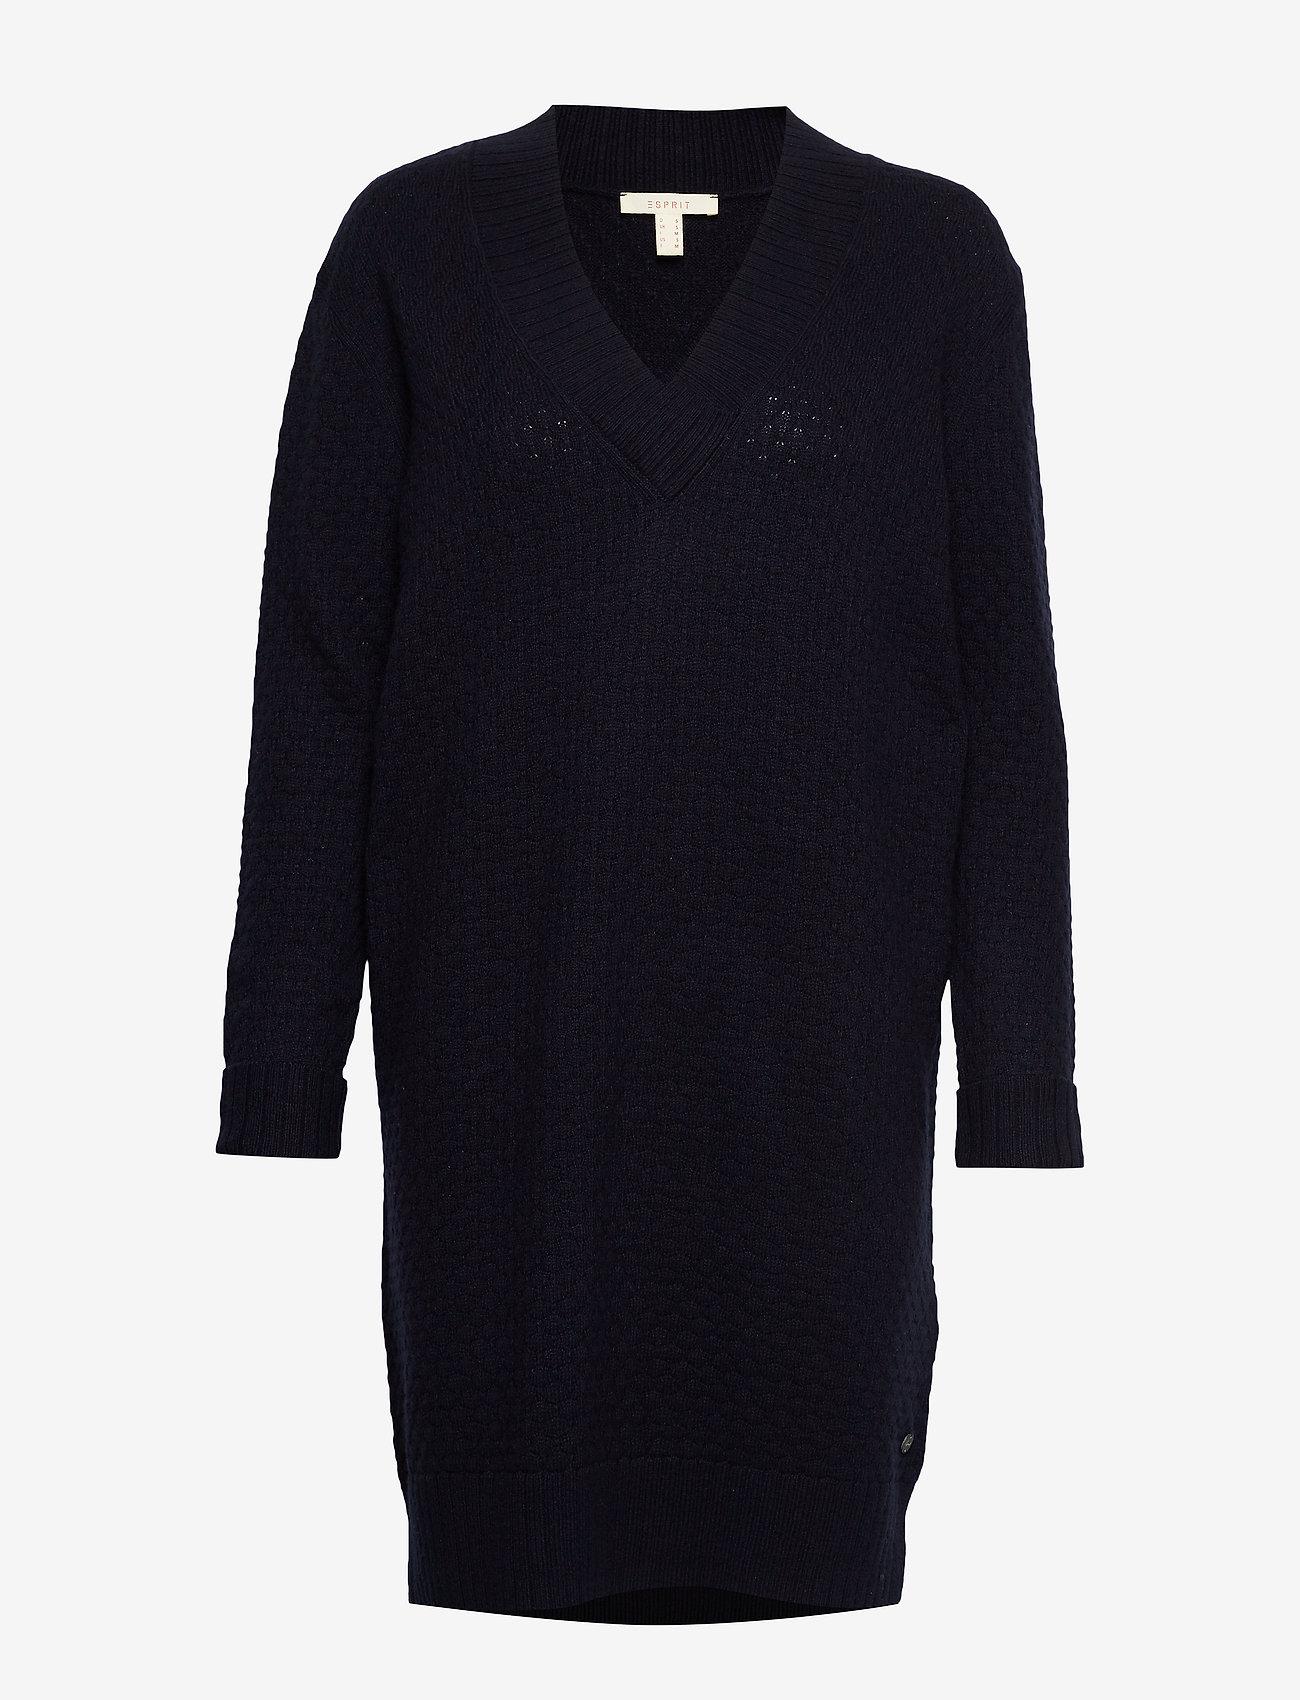 Esprit Casual - Dresses flat knitted - strikkjoler - navy - 0